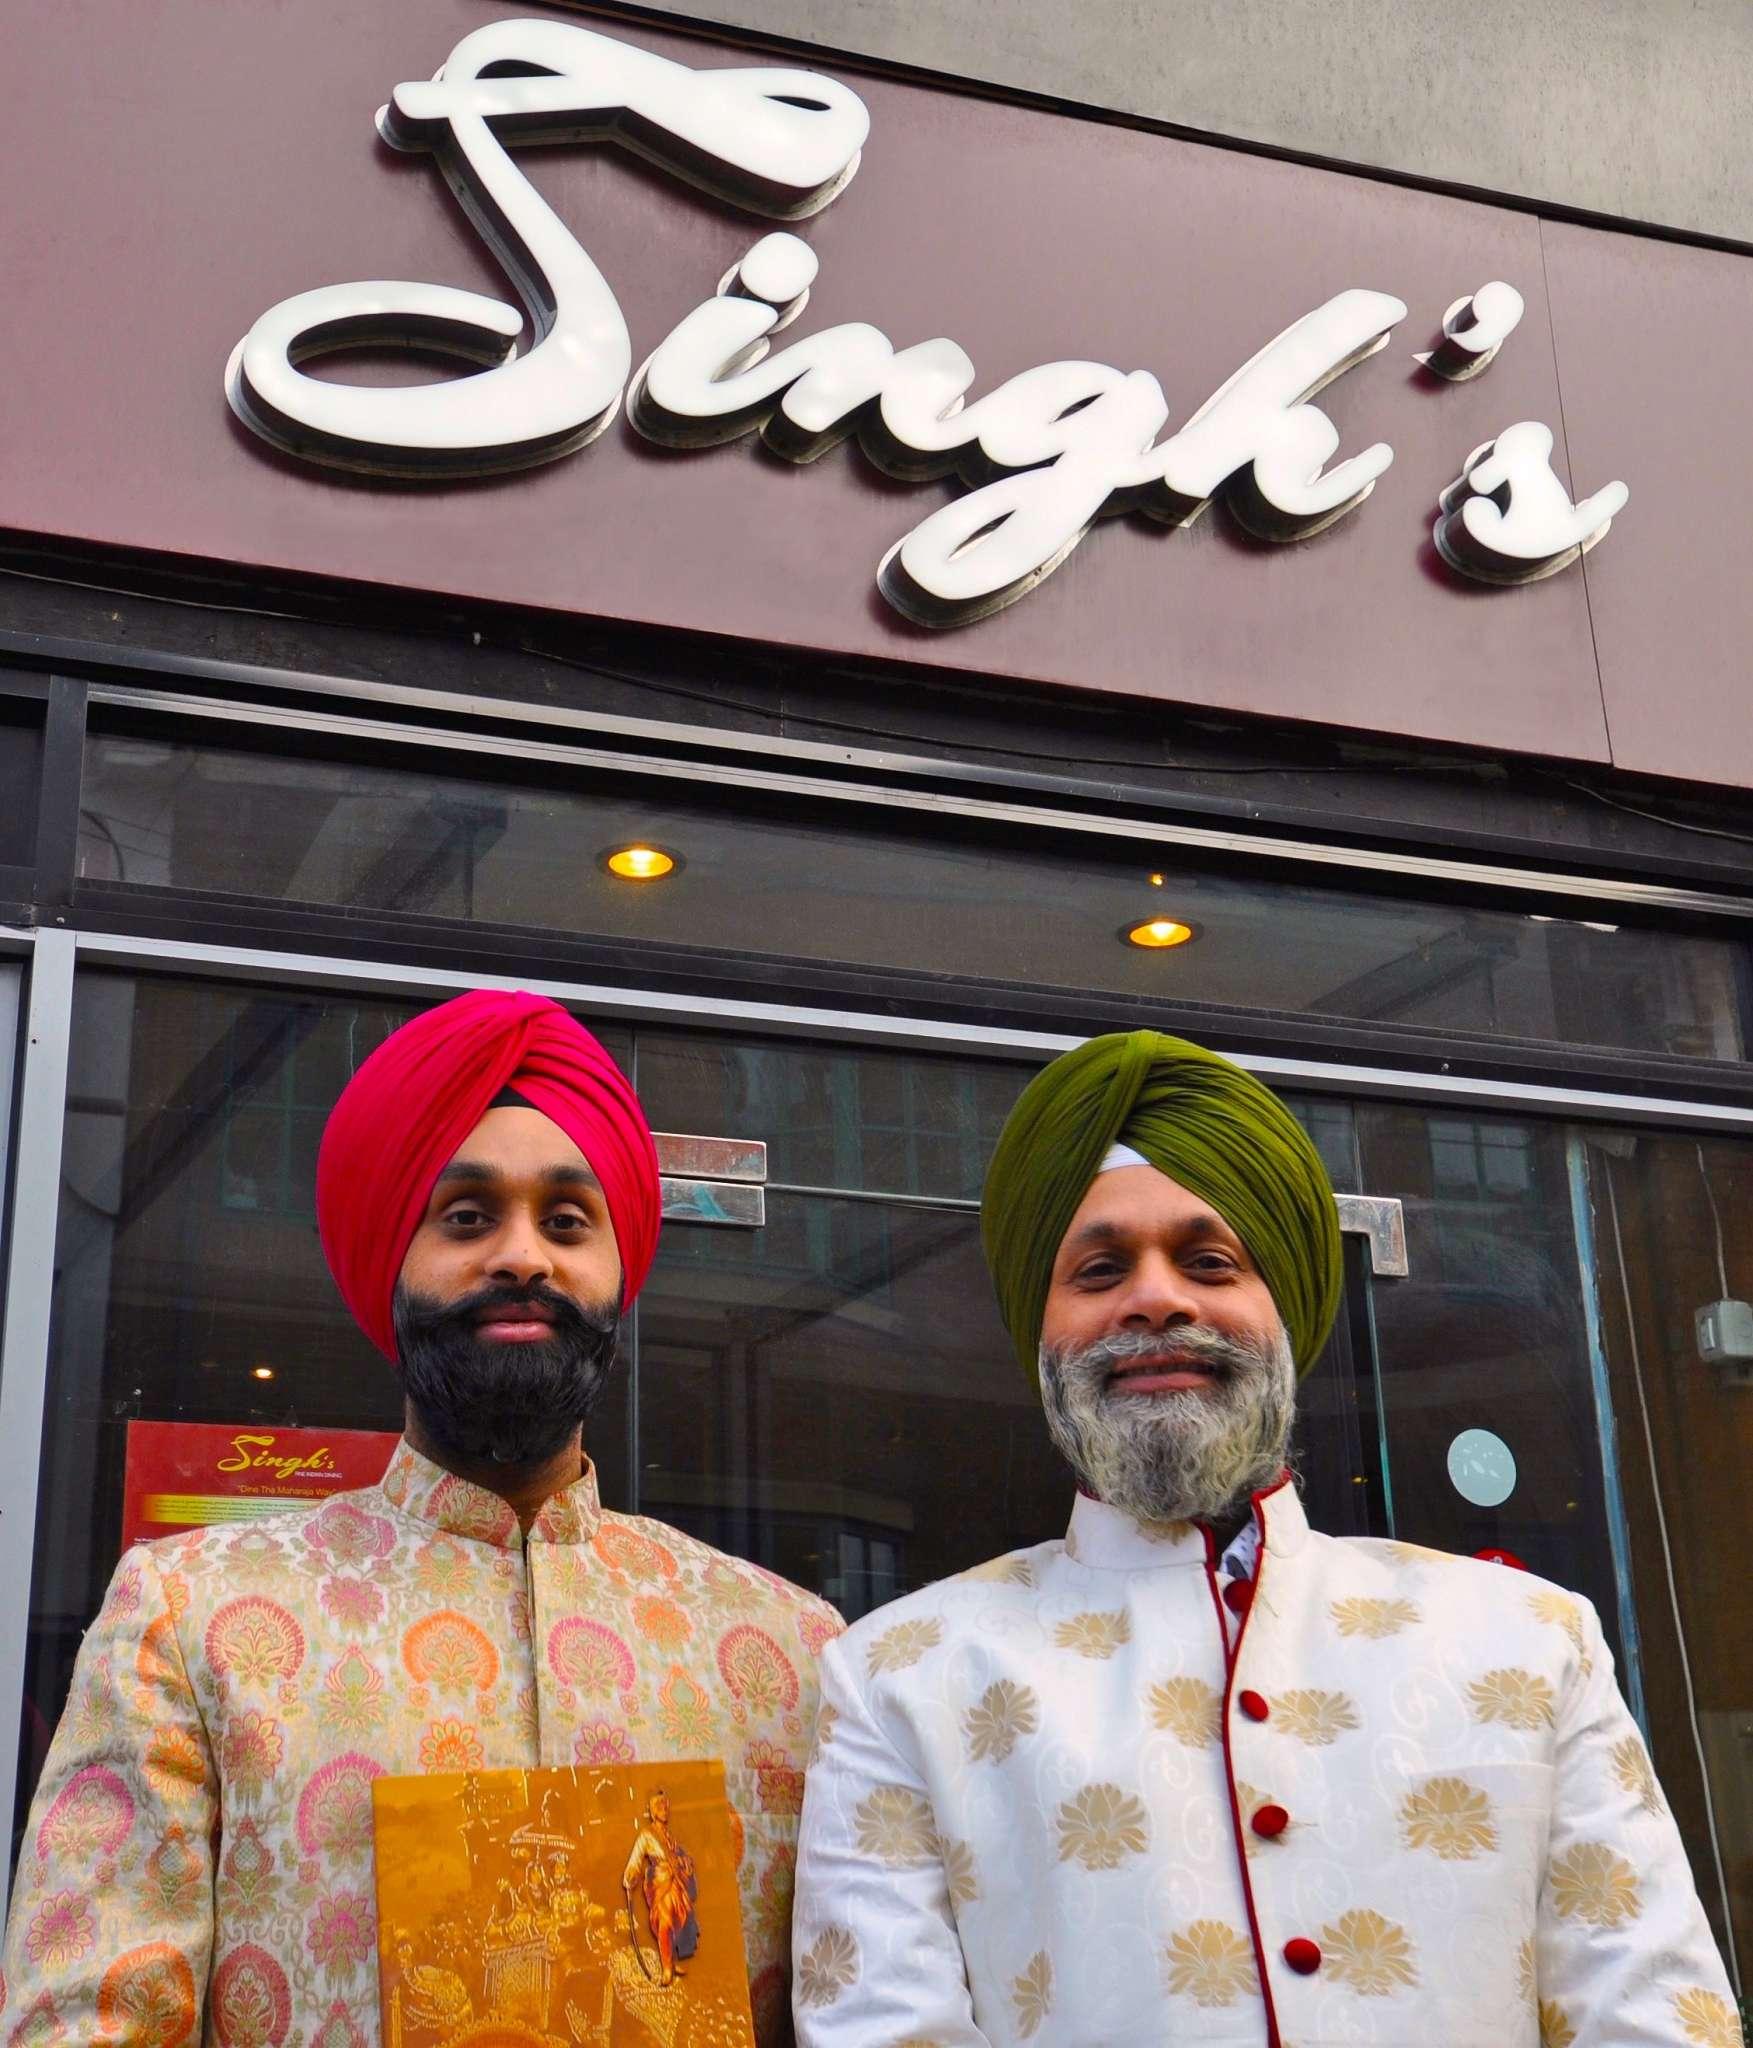 Press night: Singh's Fine Dining Restaurant, Nottingham